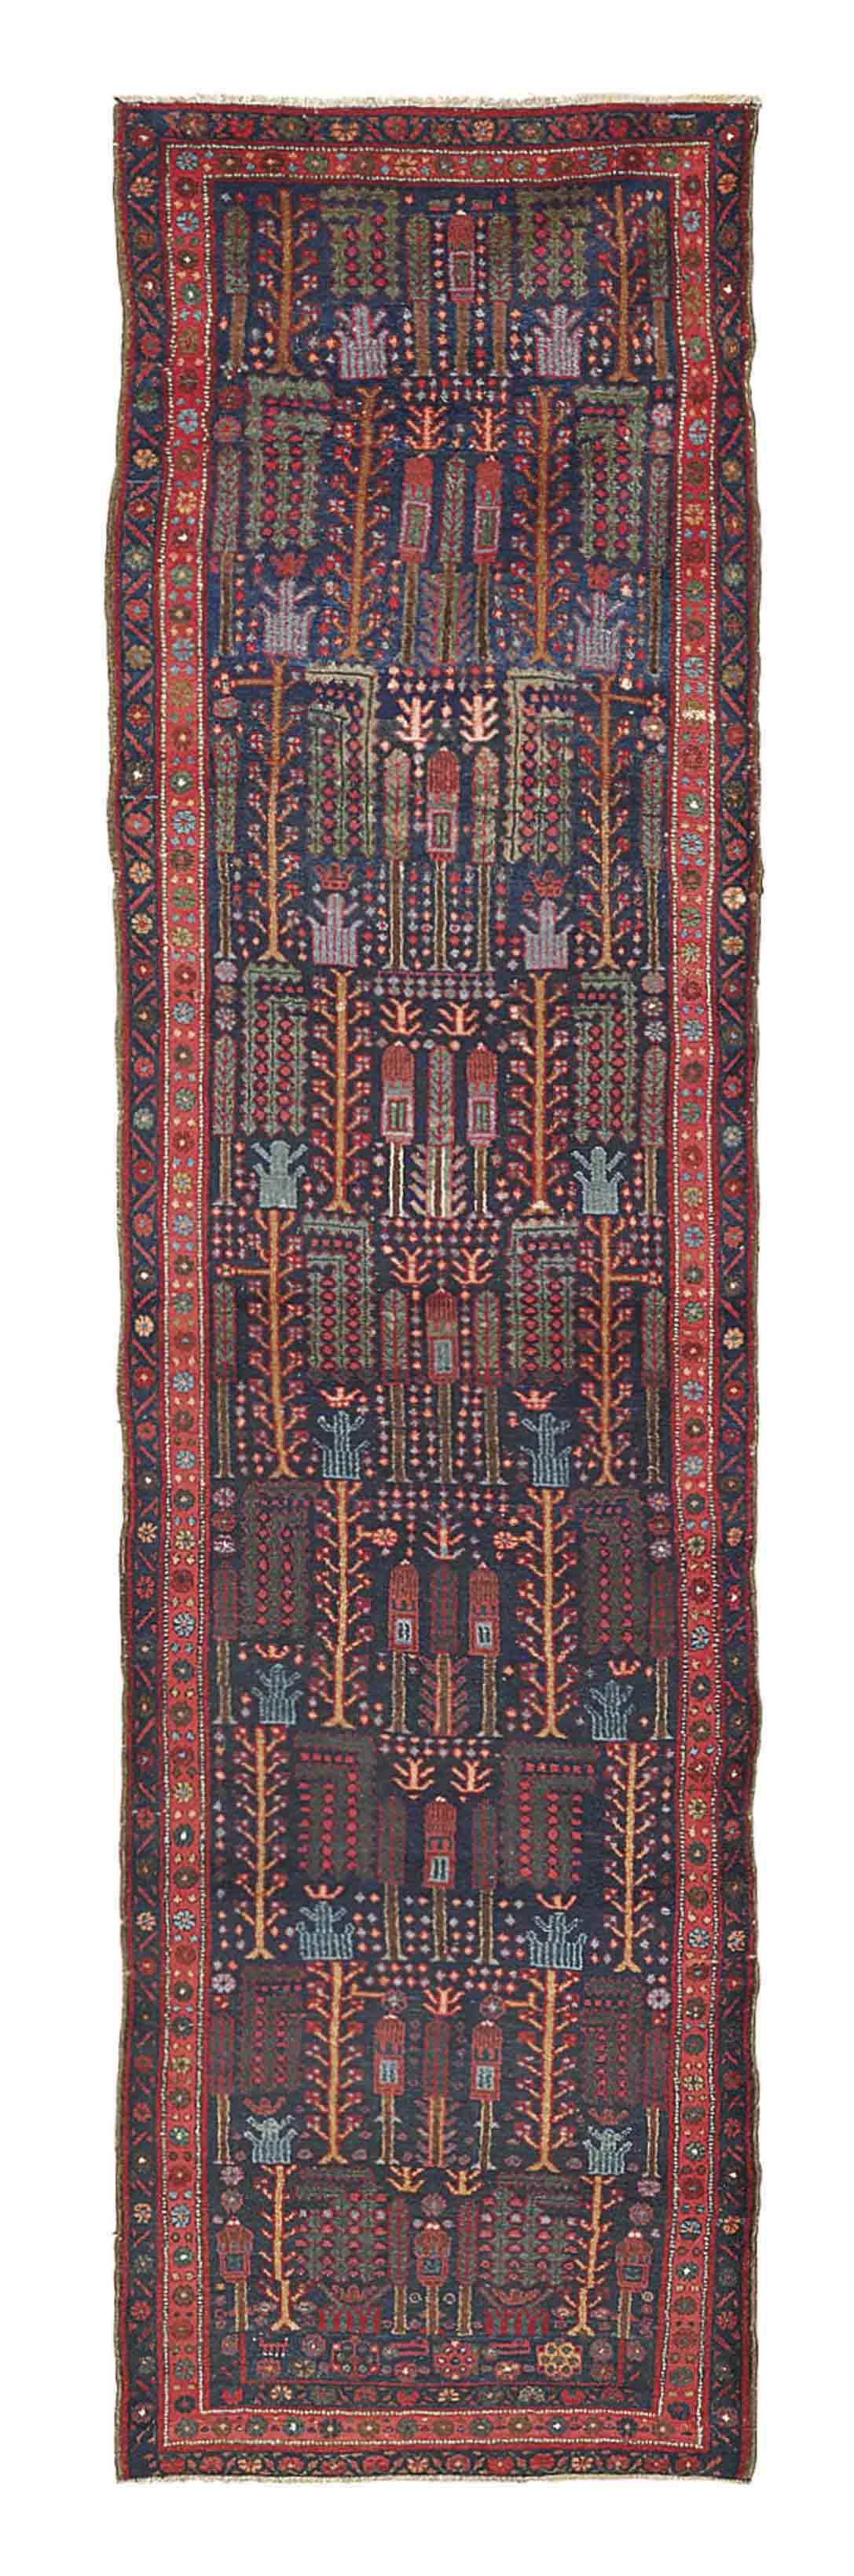 A unusual North-West Persian r